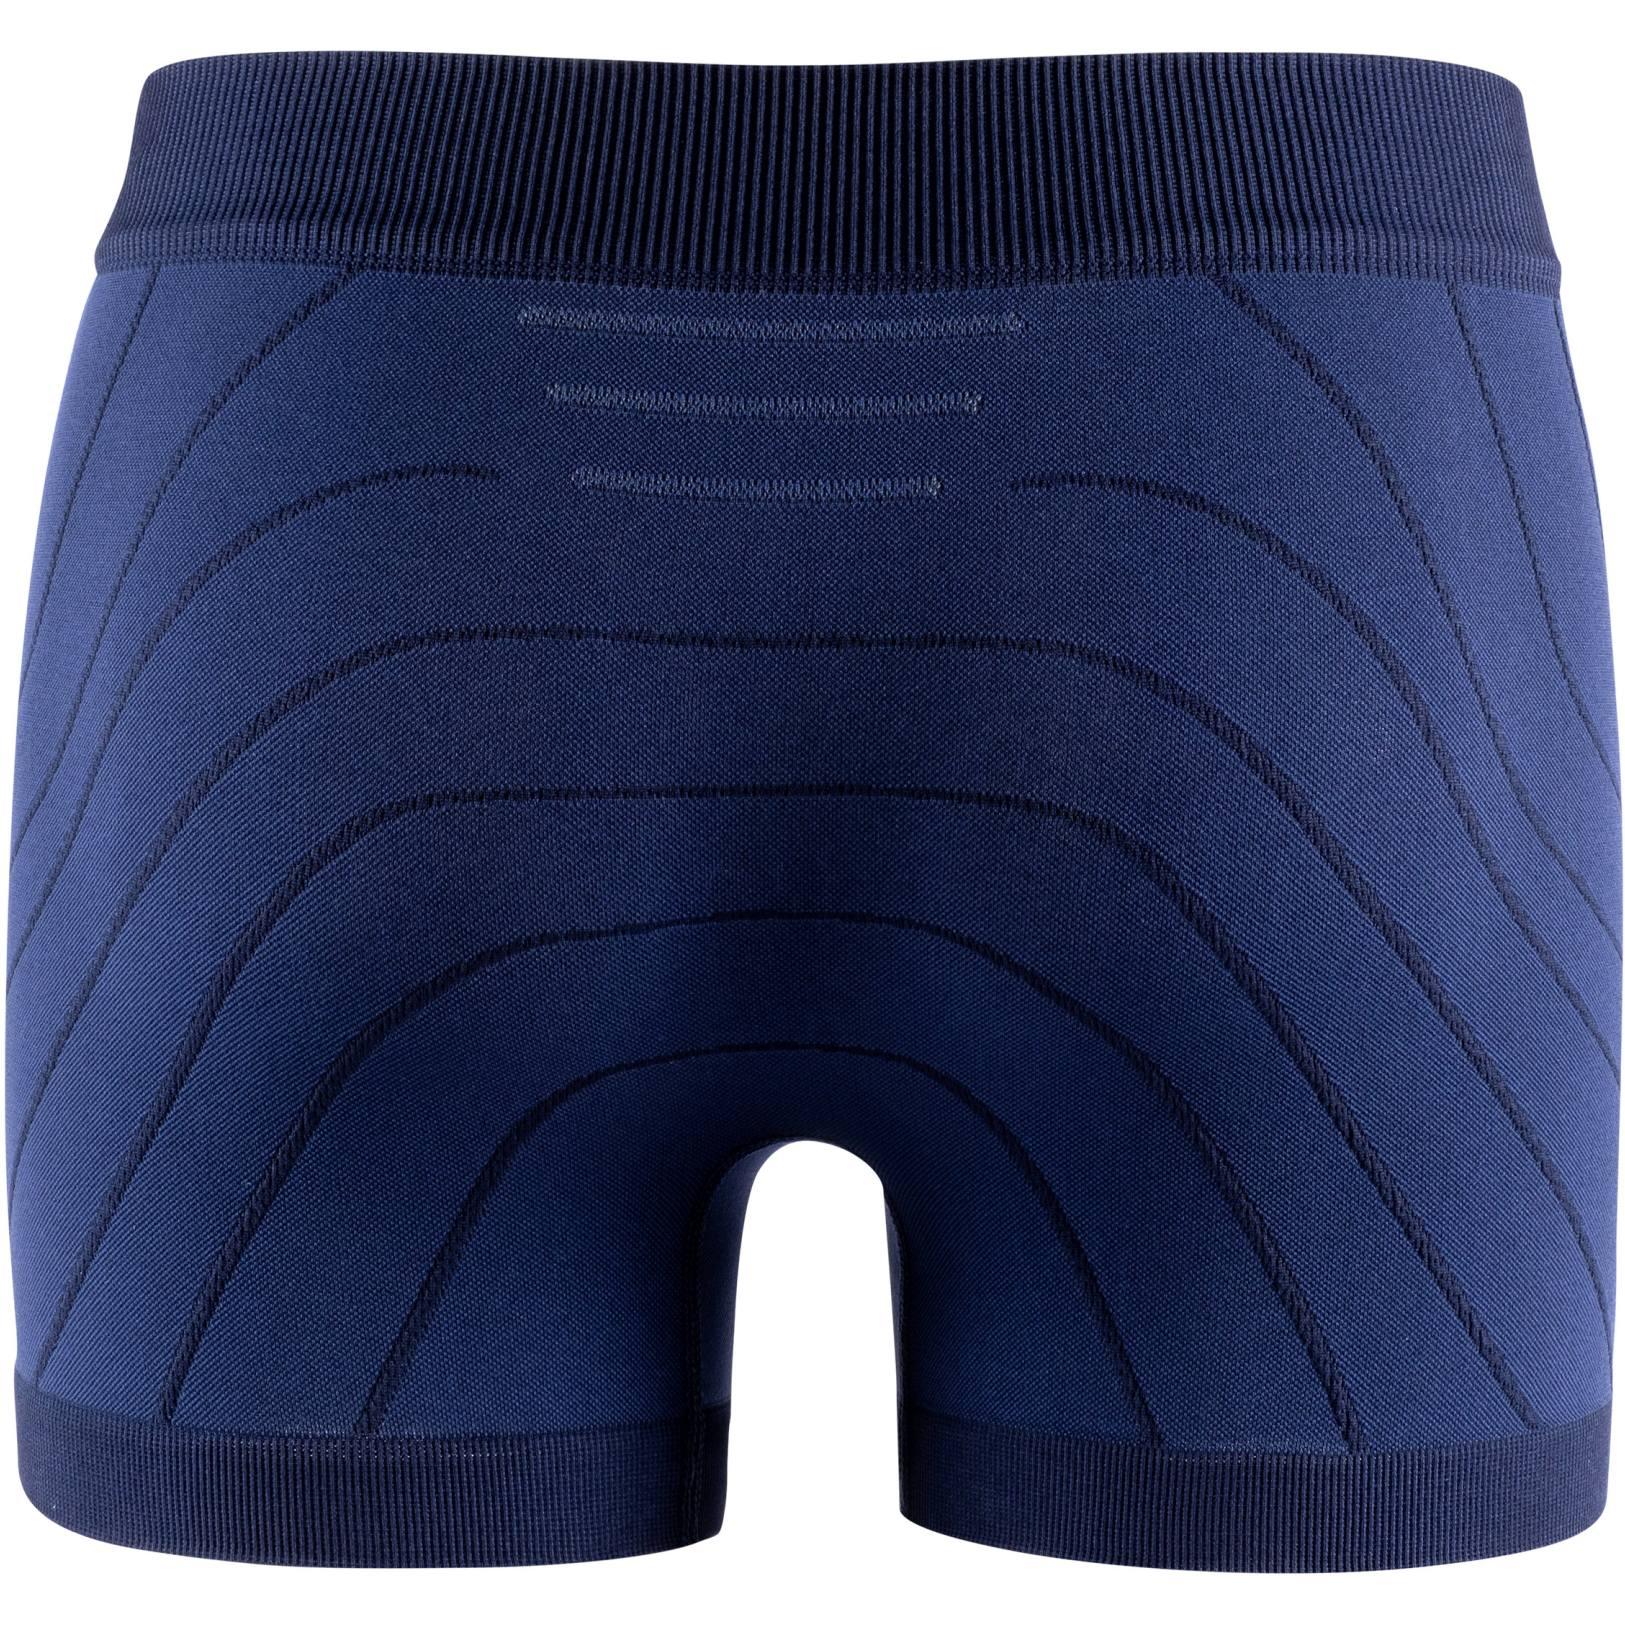 Image of UYN Motyon 2.0 Man Underwear Boxer - Blue